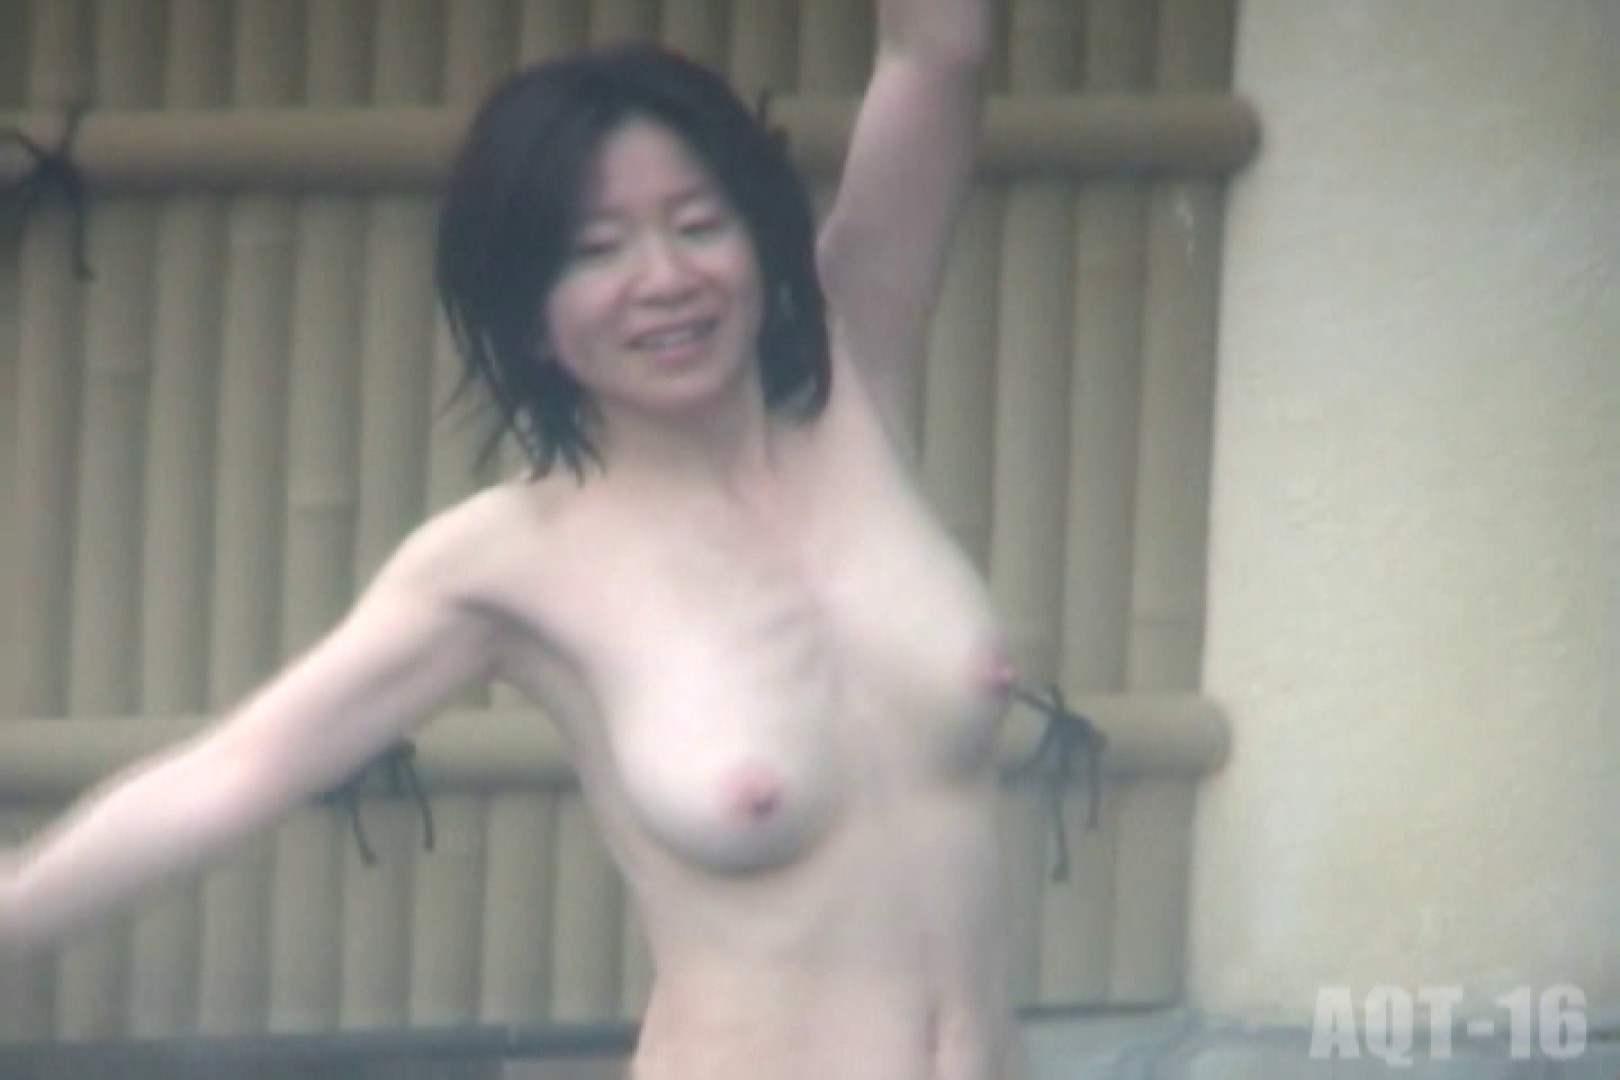 Aquaな露天風呂Vol.841 盗撮師作品 ワレメ動画紹介 77pic 44